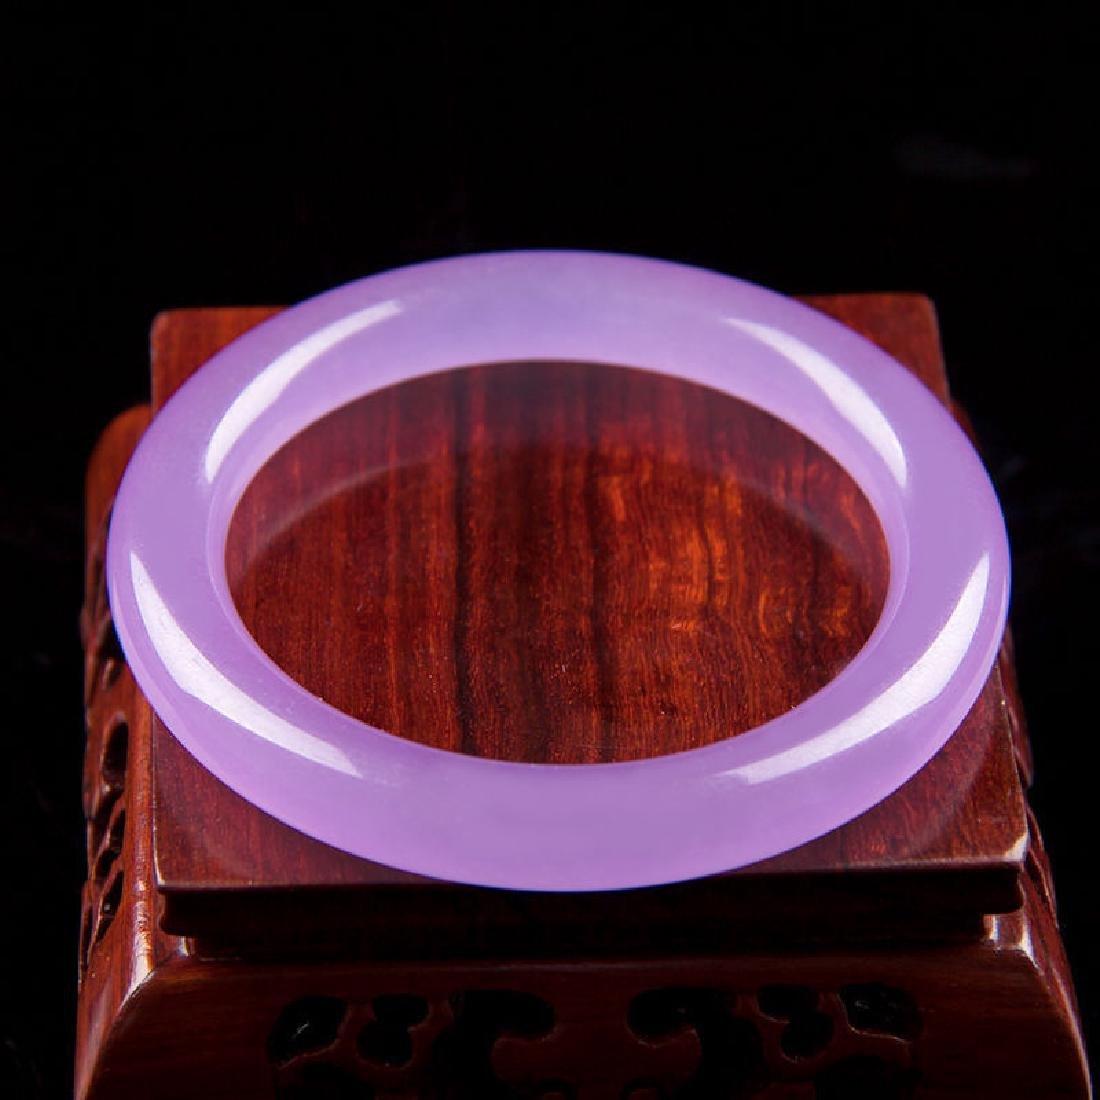 Certified 100% Natural purple Jade Bangle Bracelet - 2